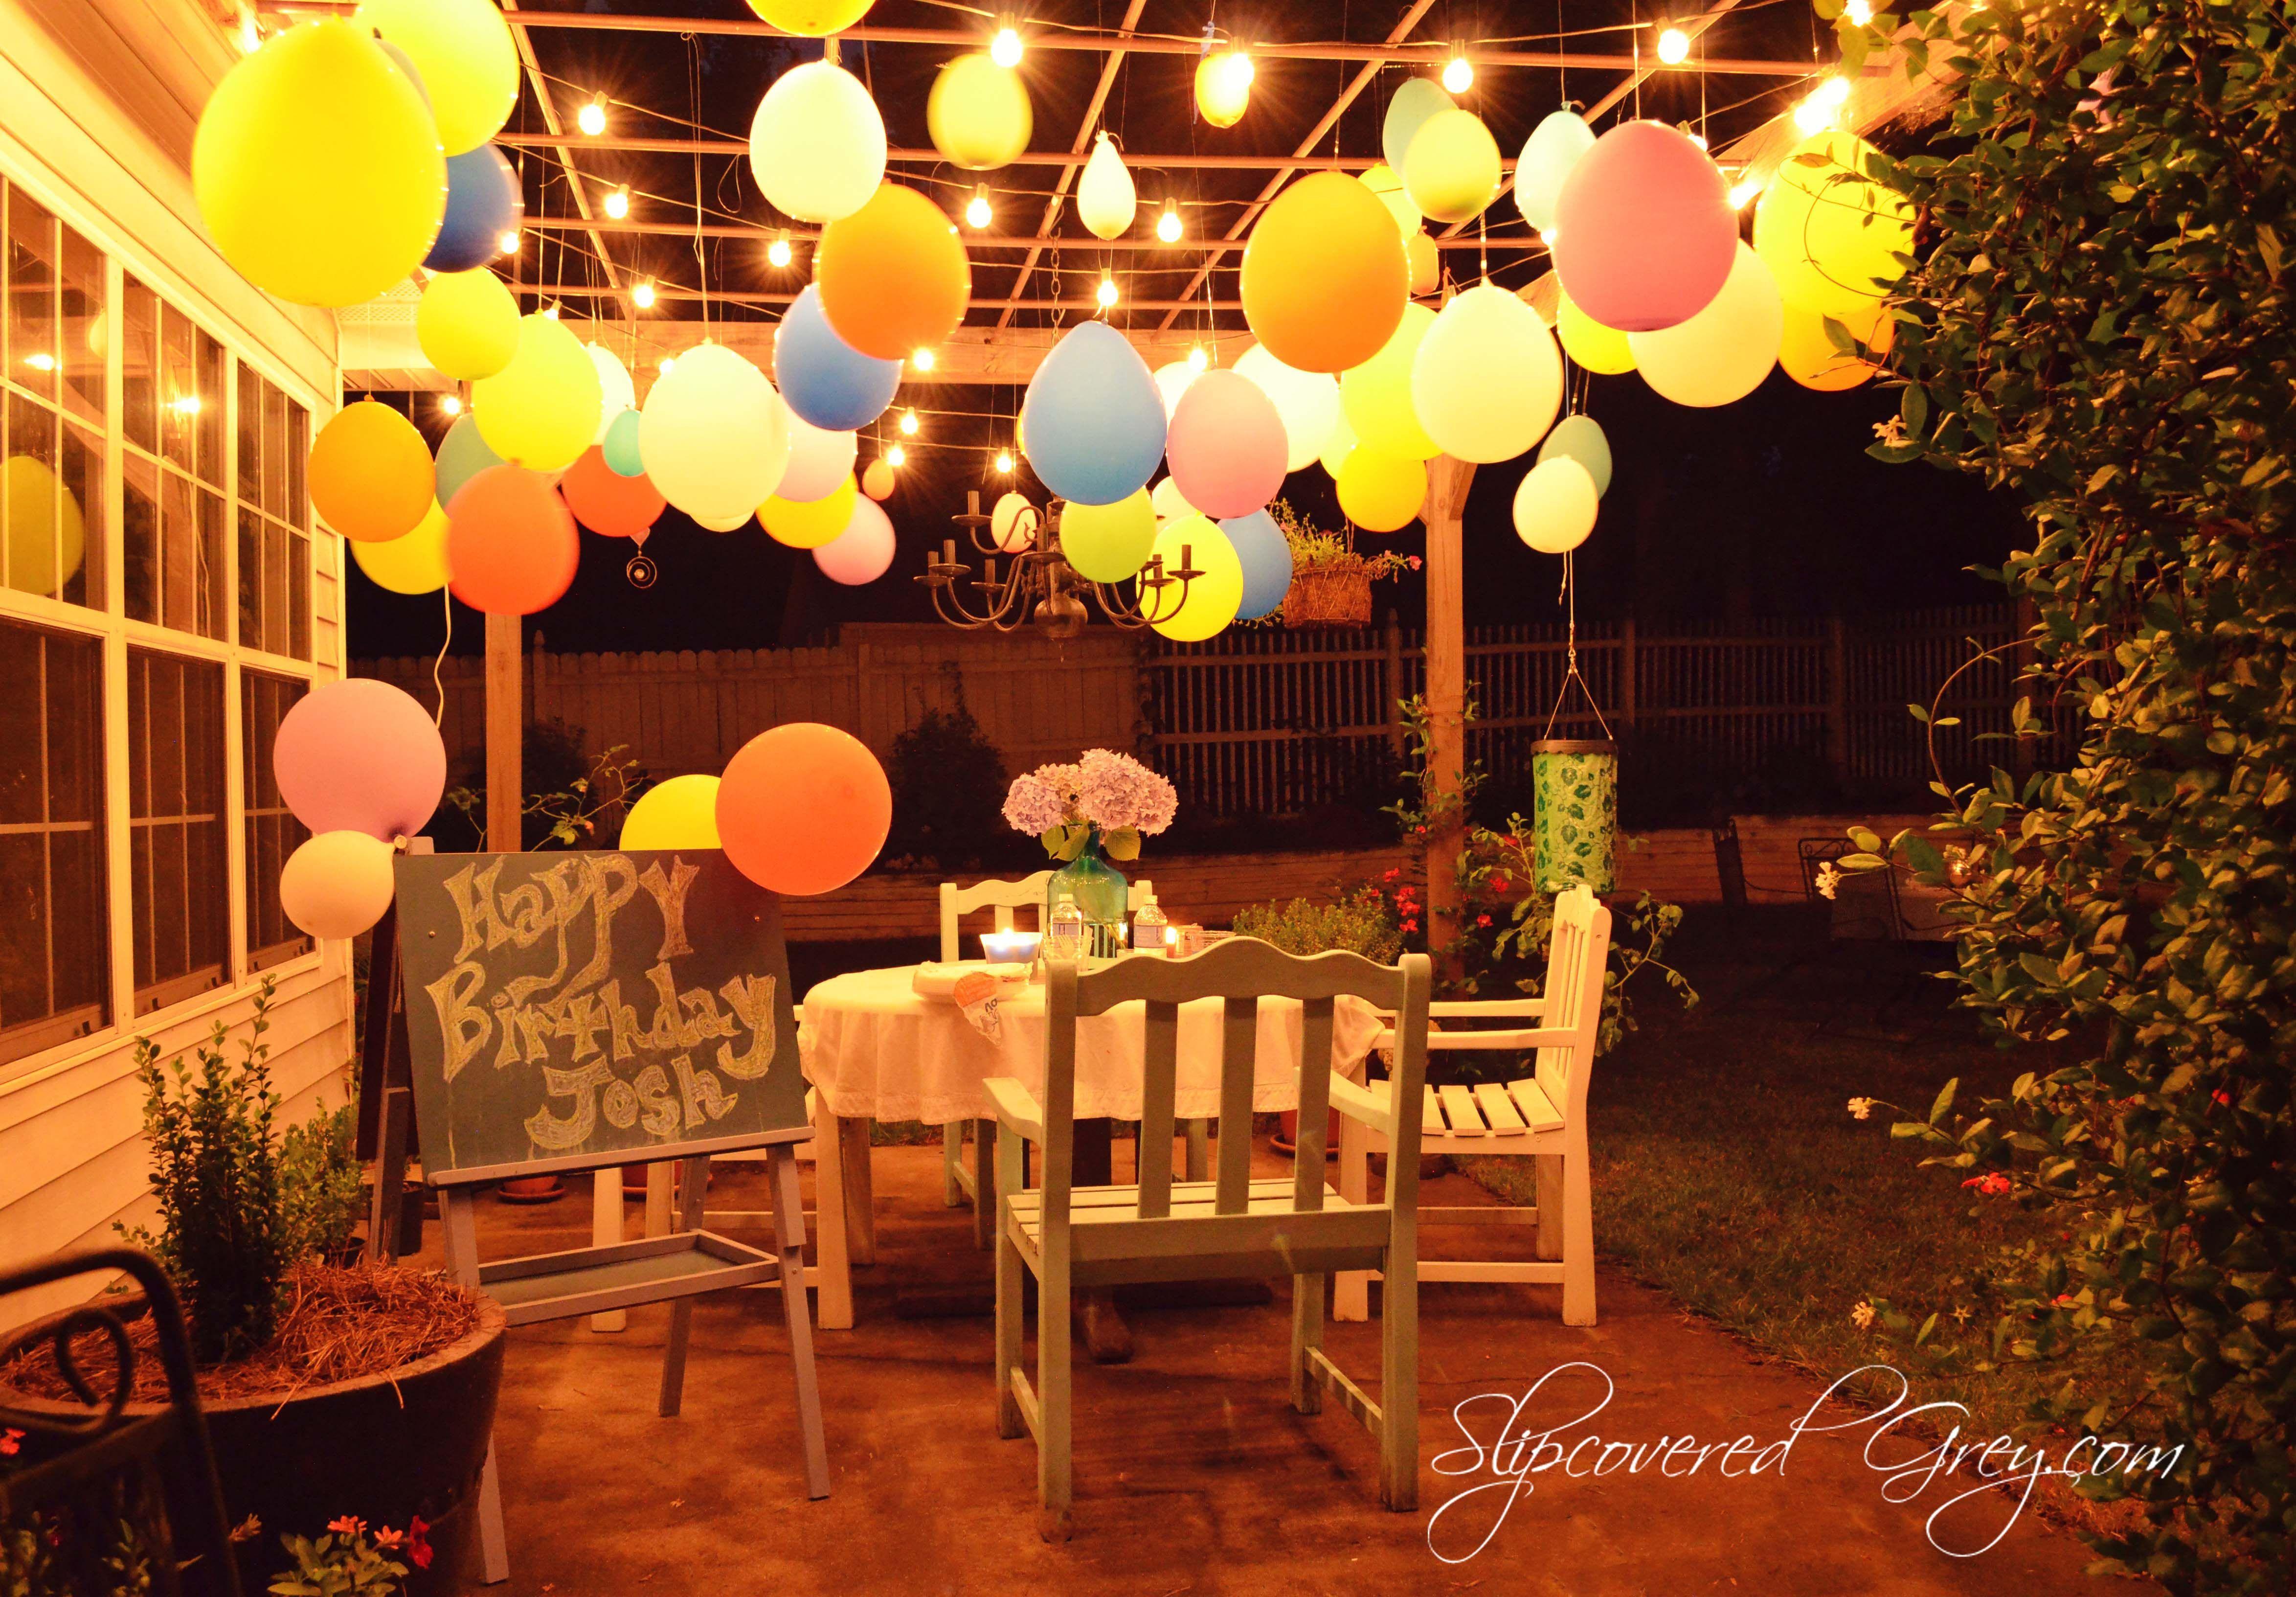 lantern light party invitation Google Search Party lanterns